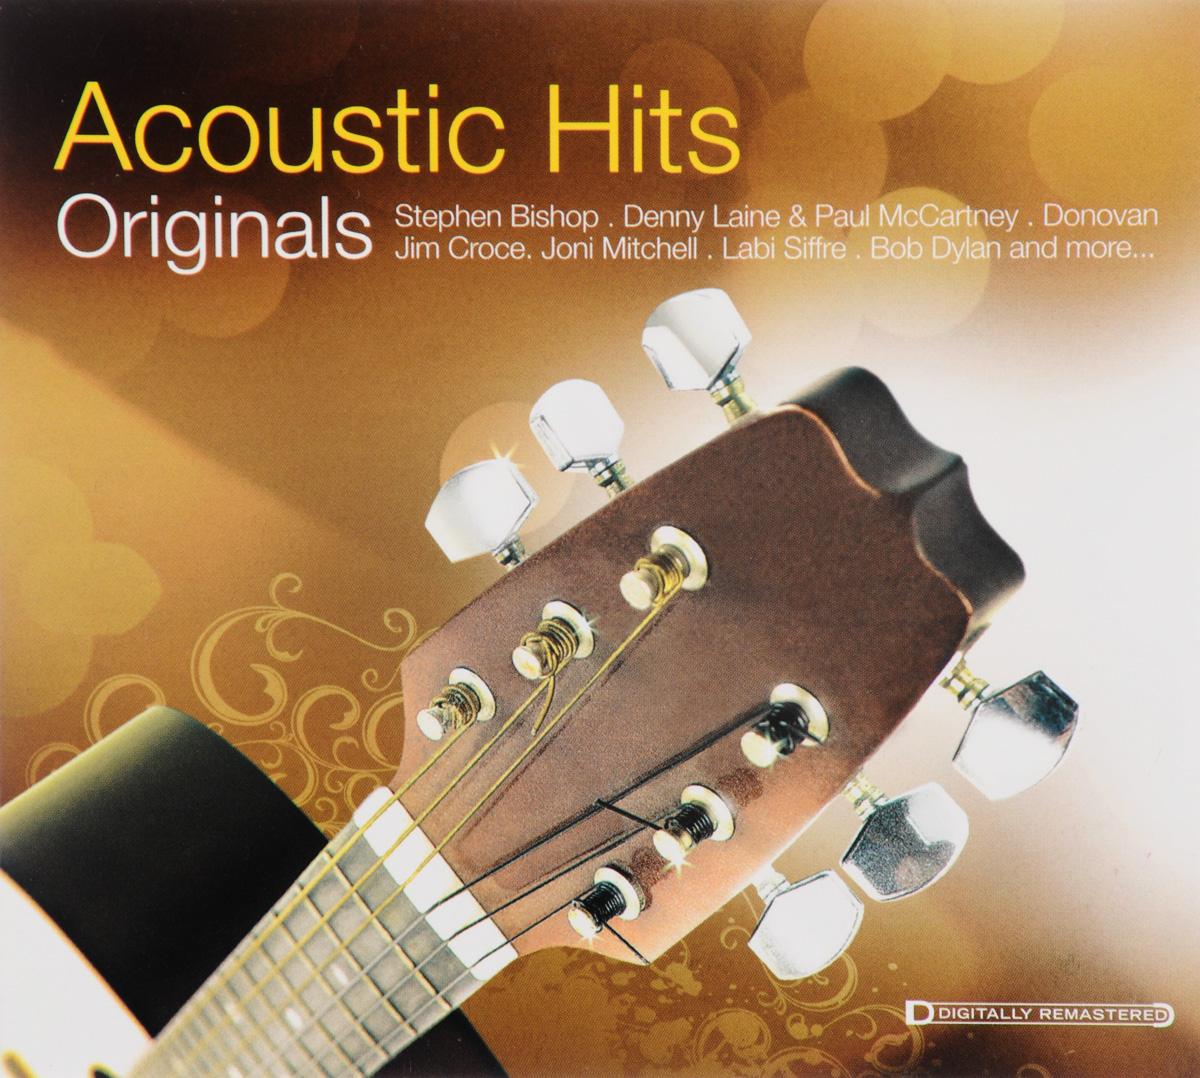 Стефан Бишоп,Денни Лейн,Джим Крос,Лаби Сайффр,Great White,Джони Митчелл,Magna Carta,Линн Андерсон,The Lovin' Spoonful,Боб Дилан Acoustic Hits. Originals magna carta